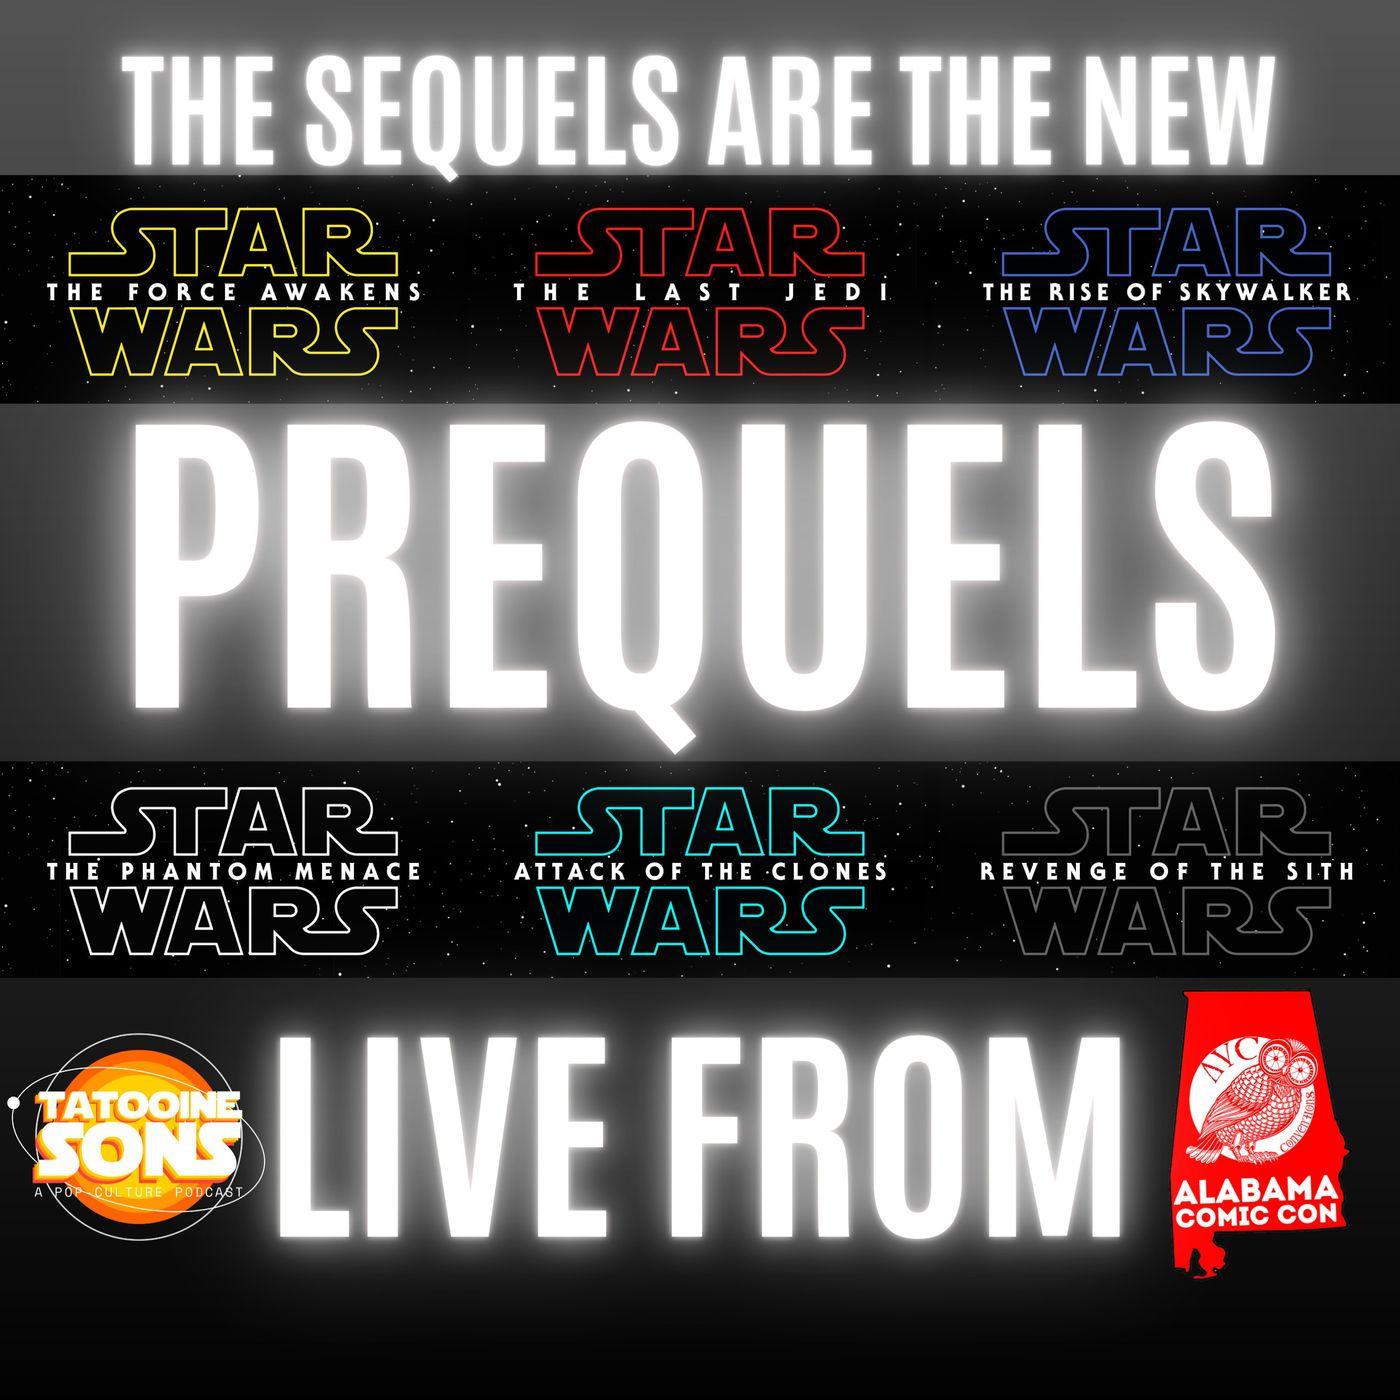 Are the Star Wars Sequels the New Prequels?